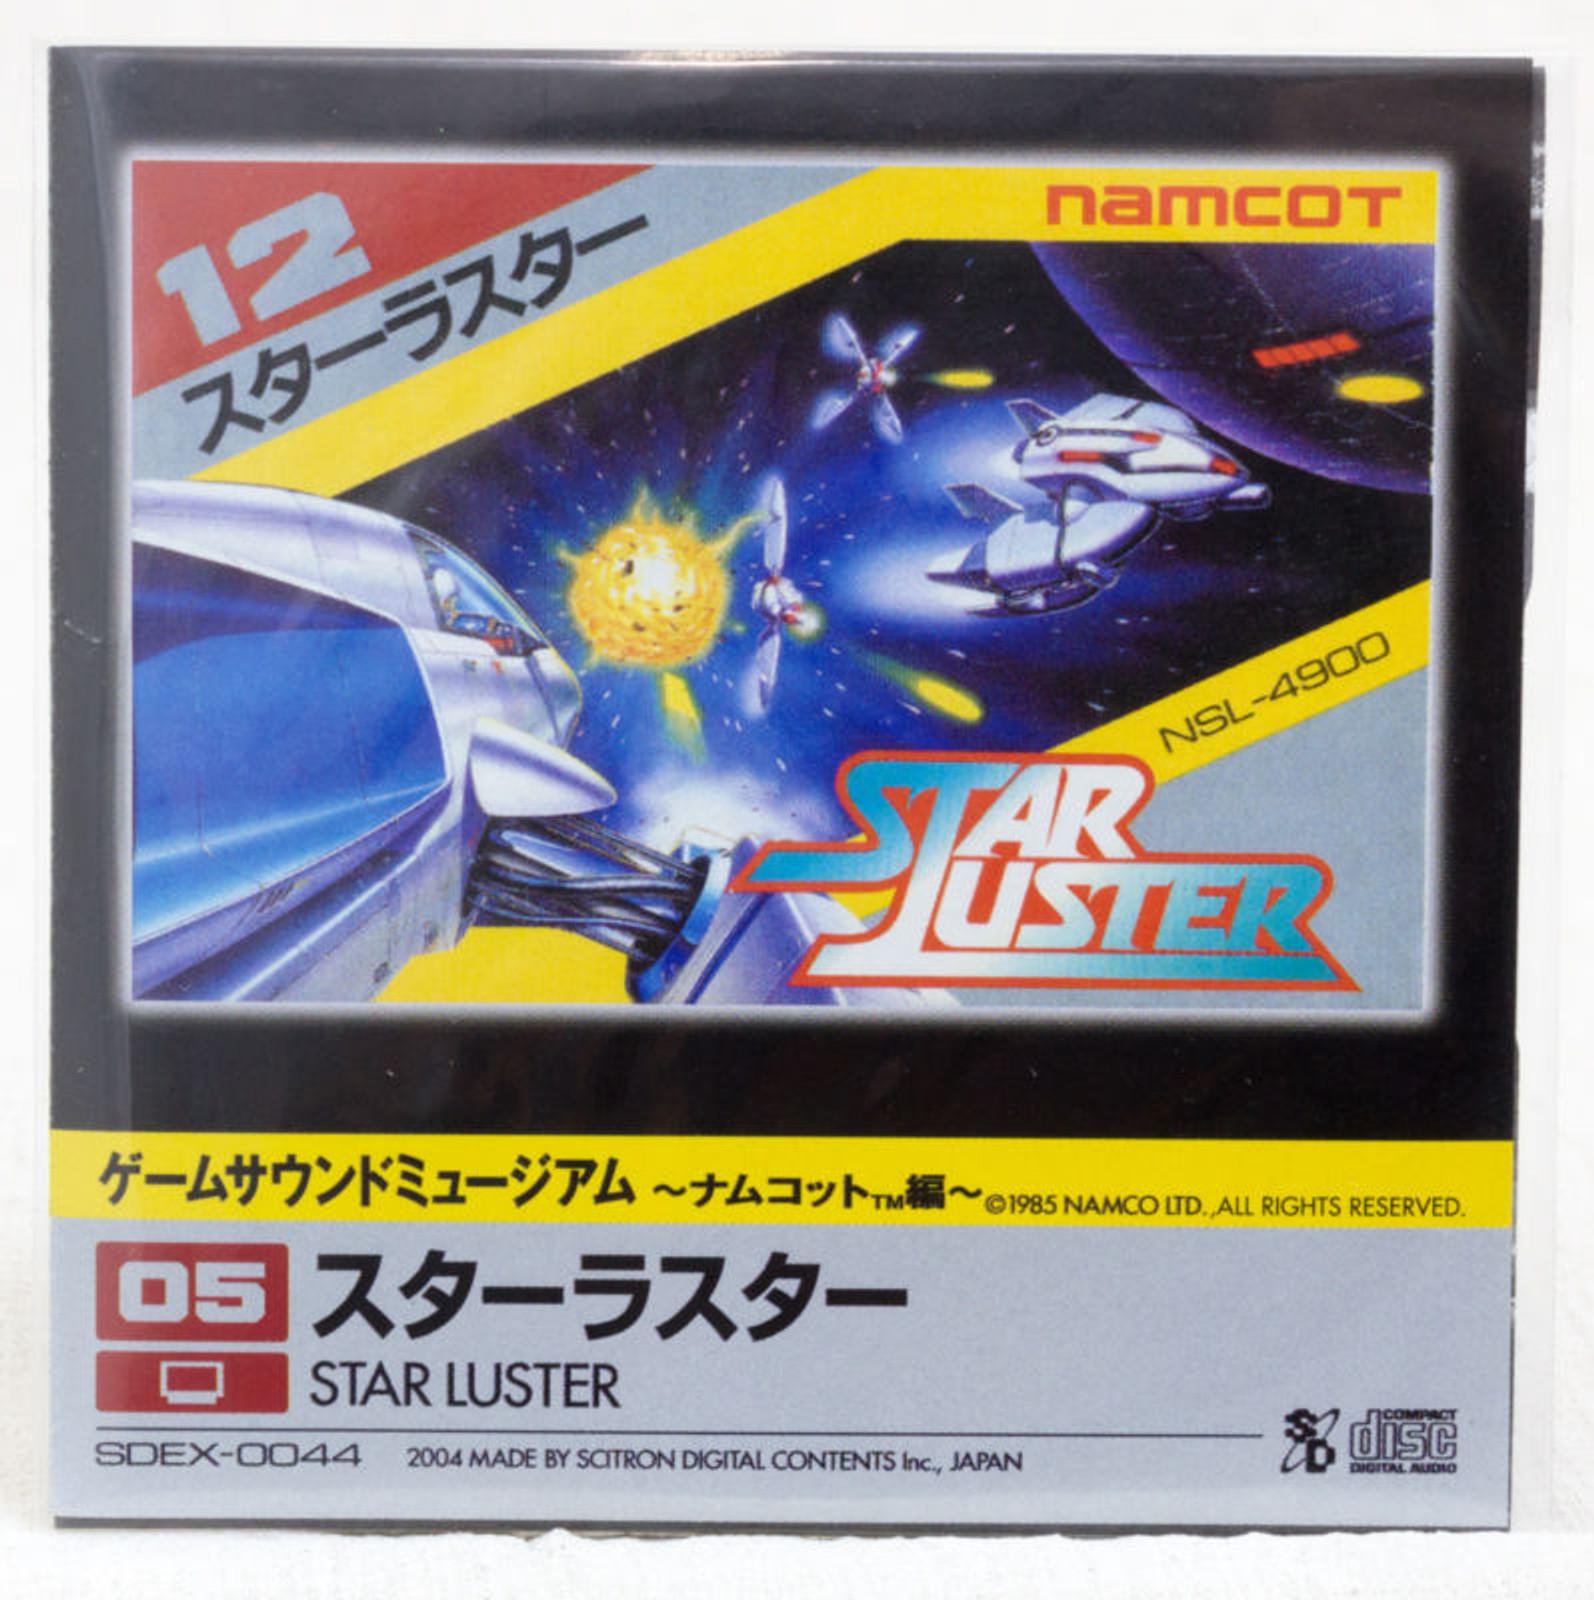 Star Luster Game Sound Museum Namco #05 Music 8cm CD JAPAN FAMICOM NINTNEDO